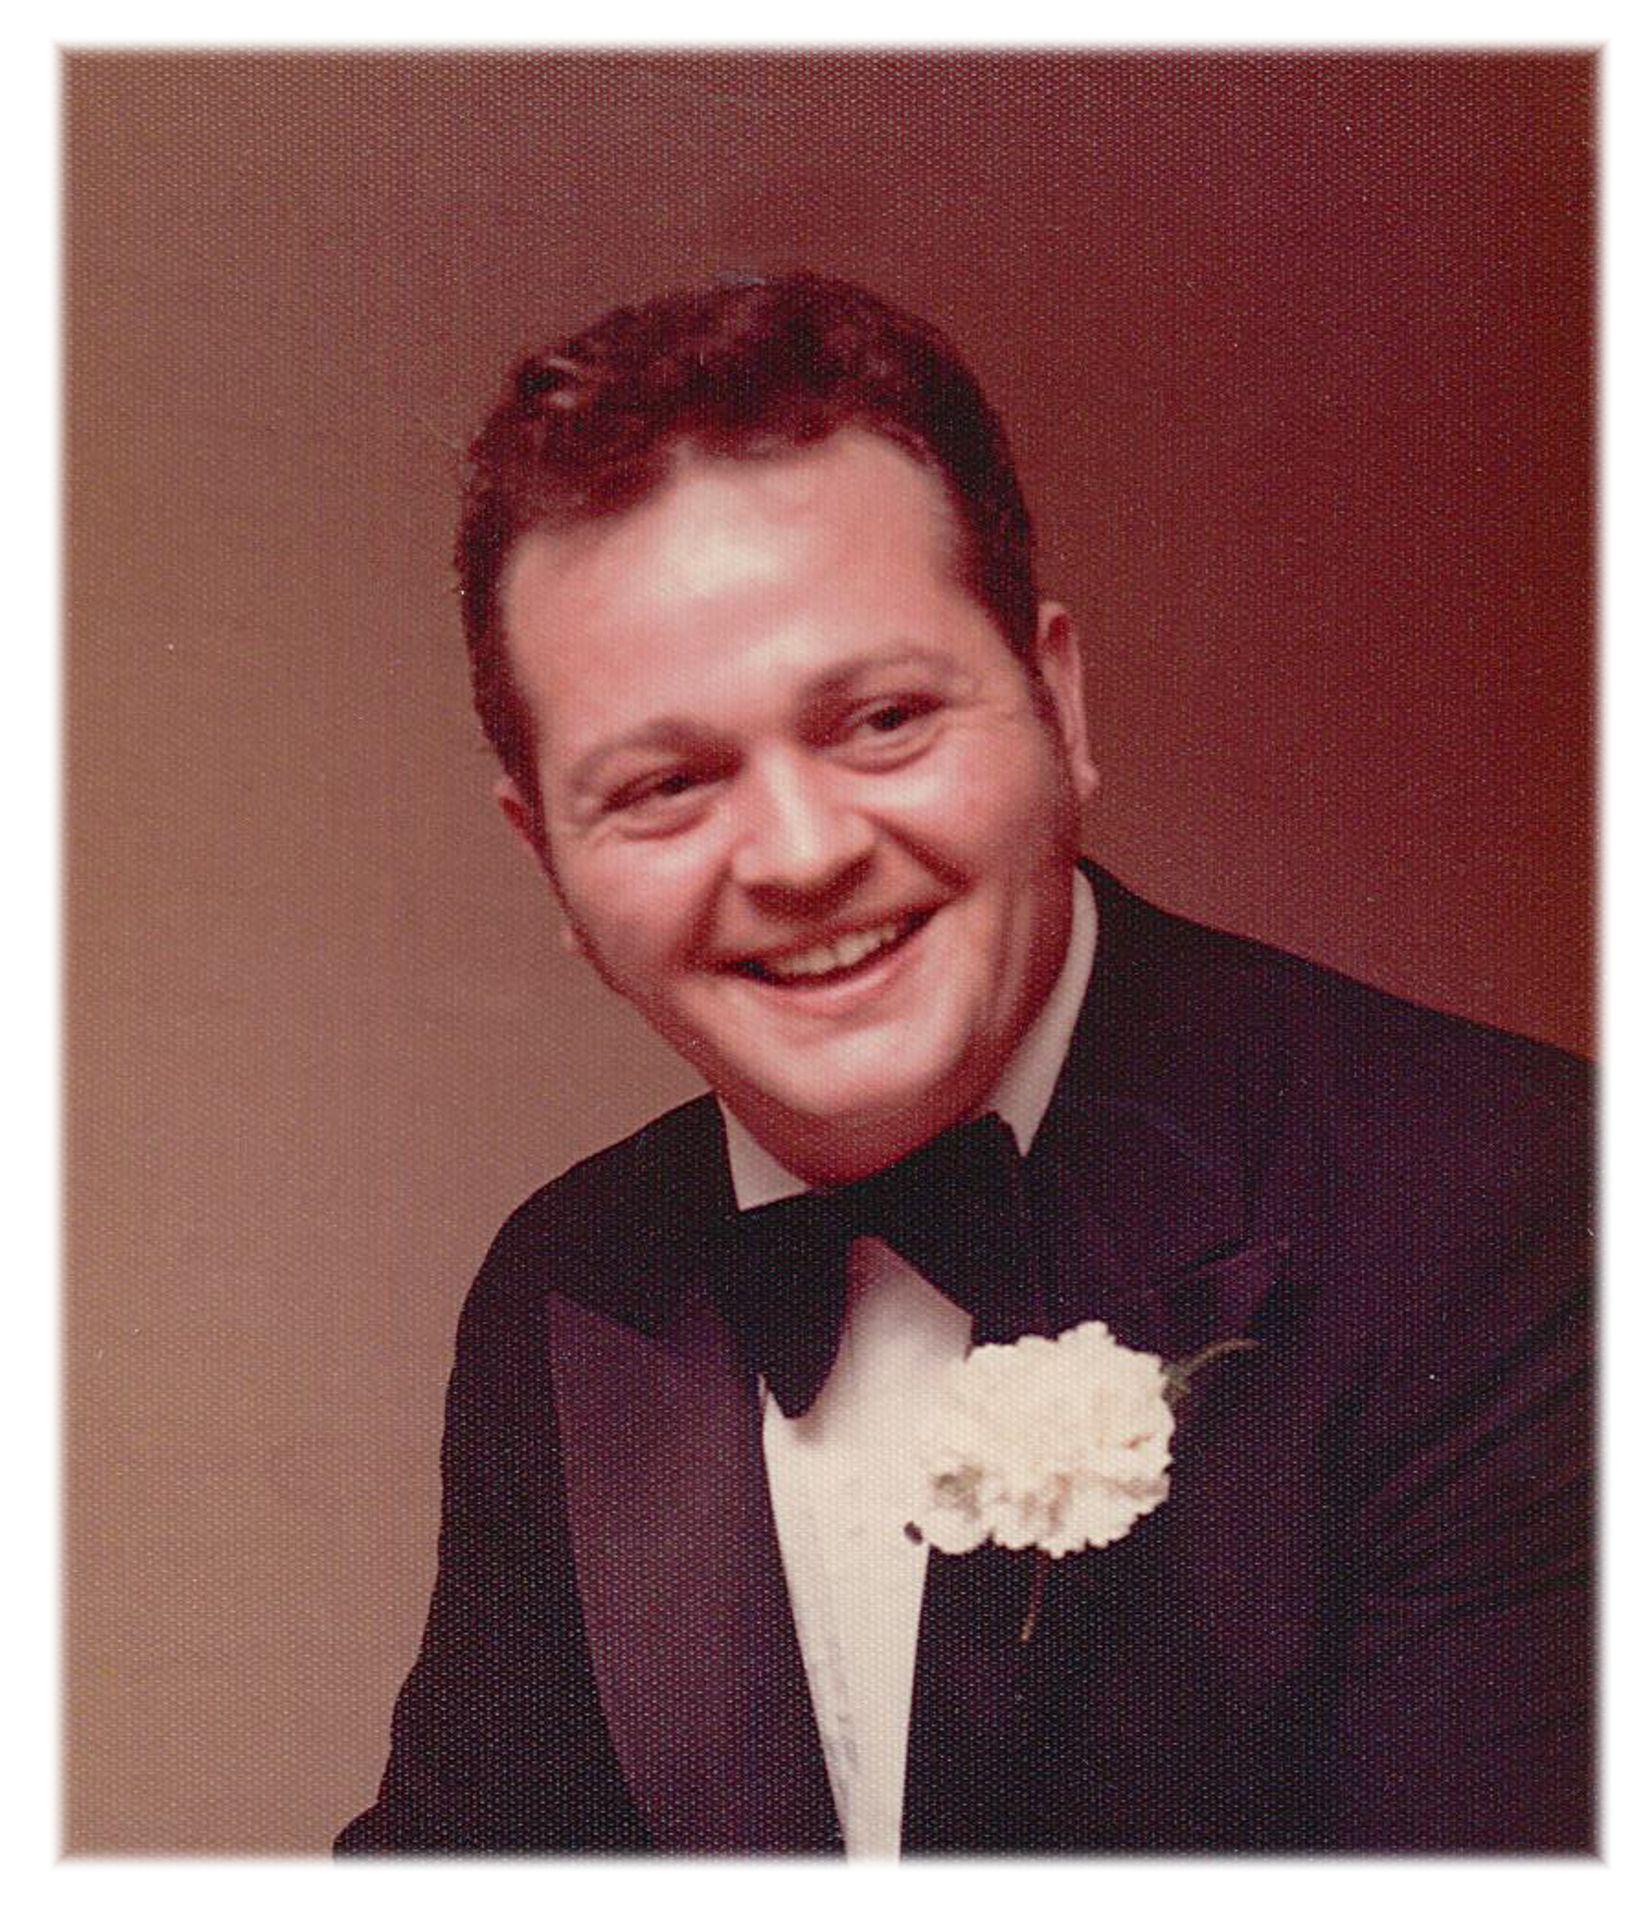 Gary R. W. Surerus